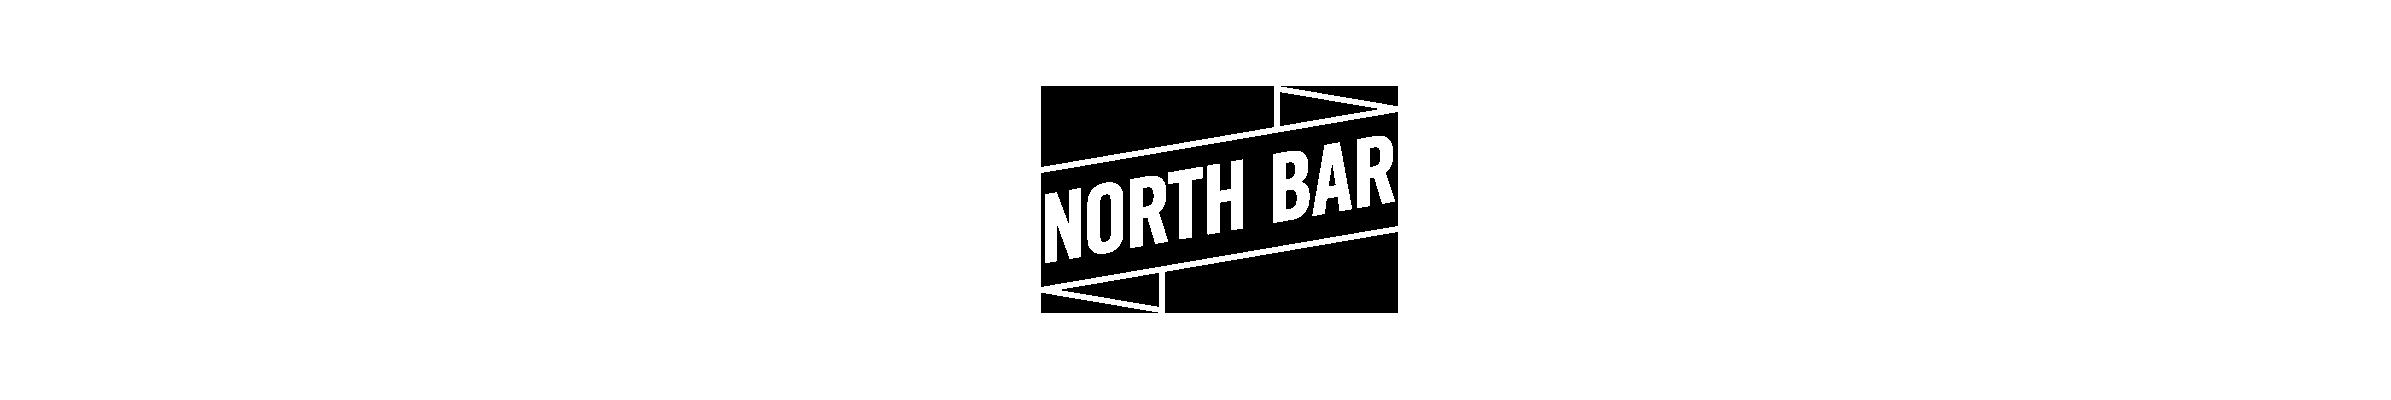 hub_logos_alphabetical